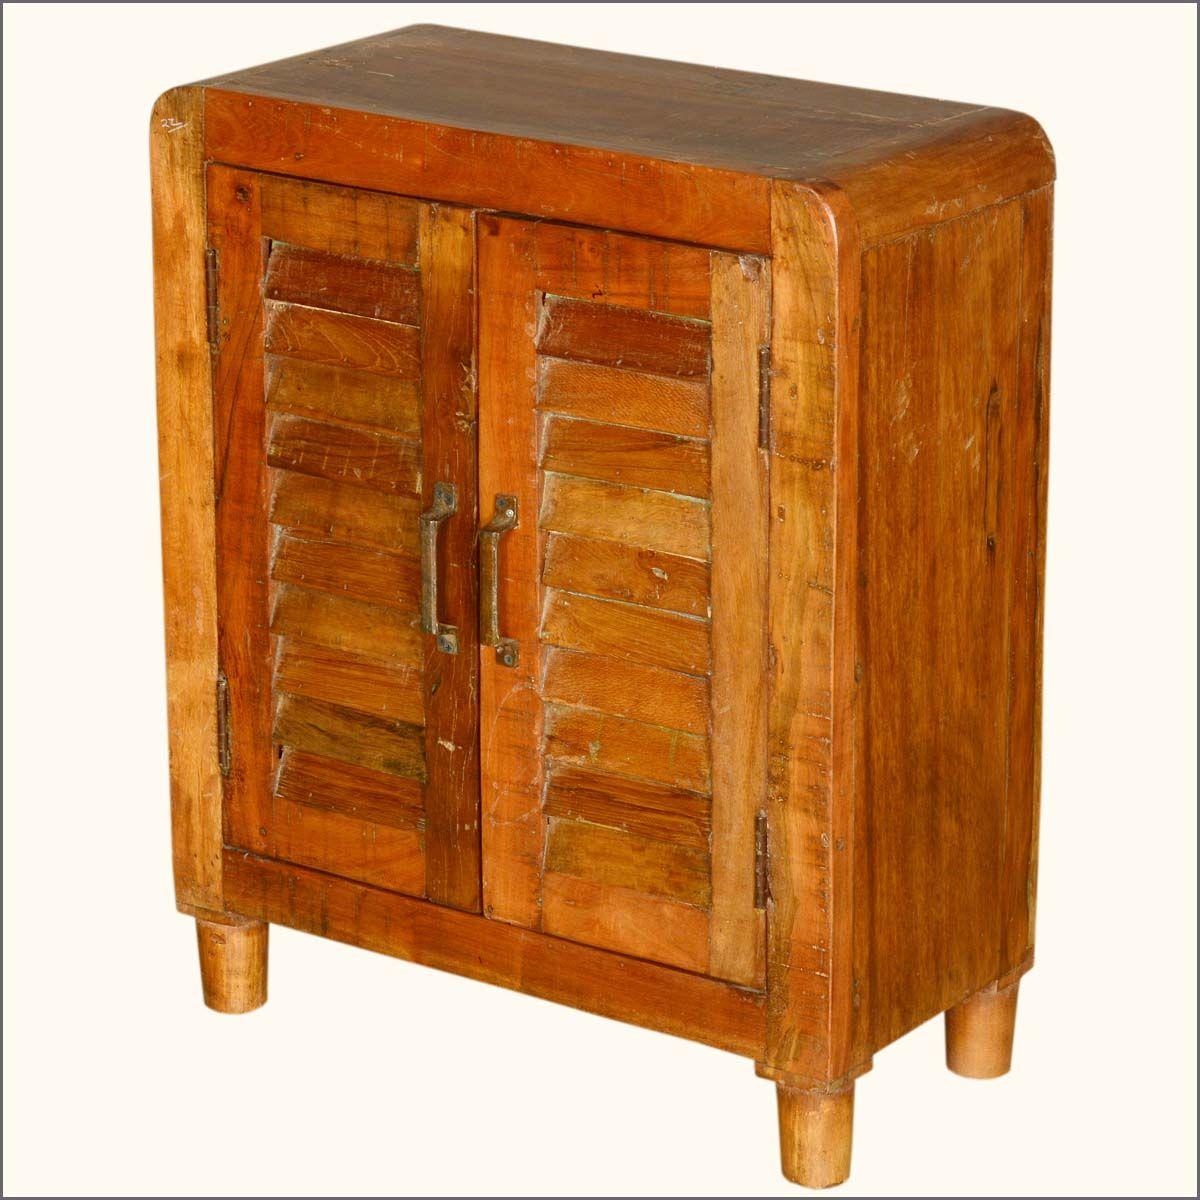 Ventnor Farmhouse Shutter Door Reclaimed Wood Storage Kitchen ...